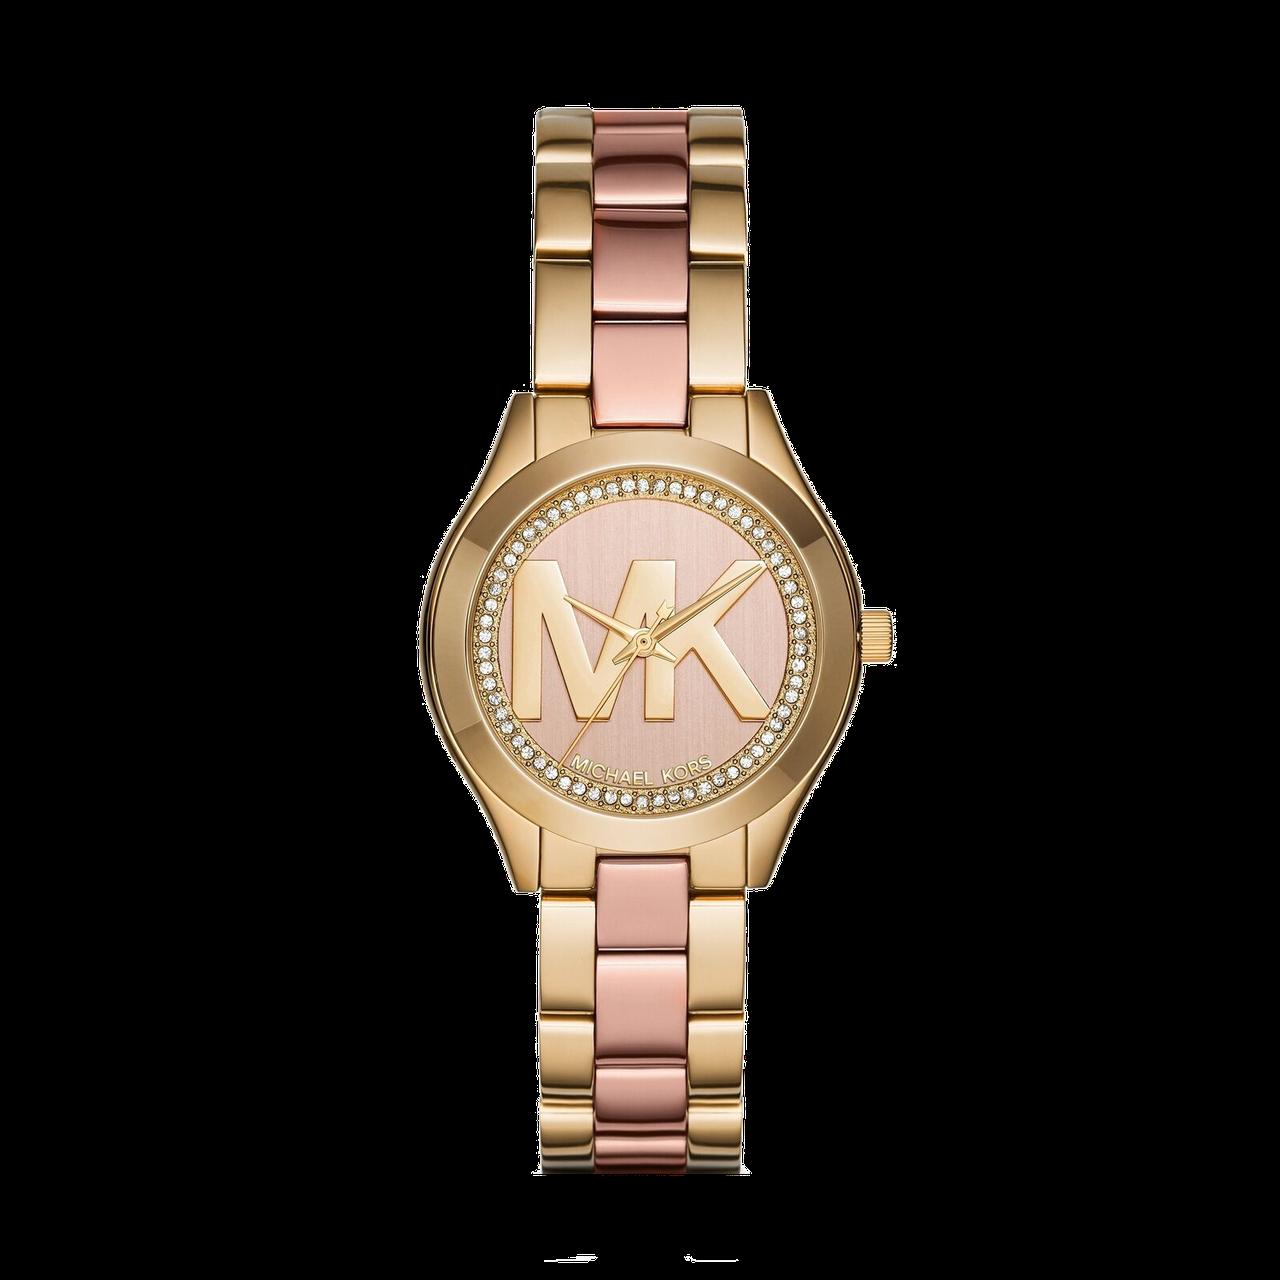 Женские часы Michael Kors MK3650